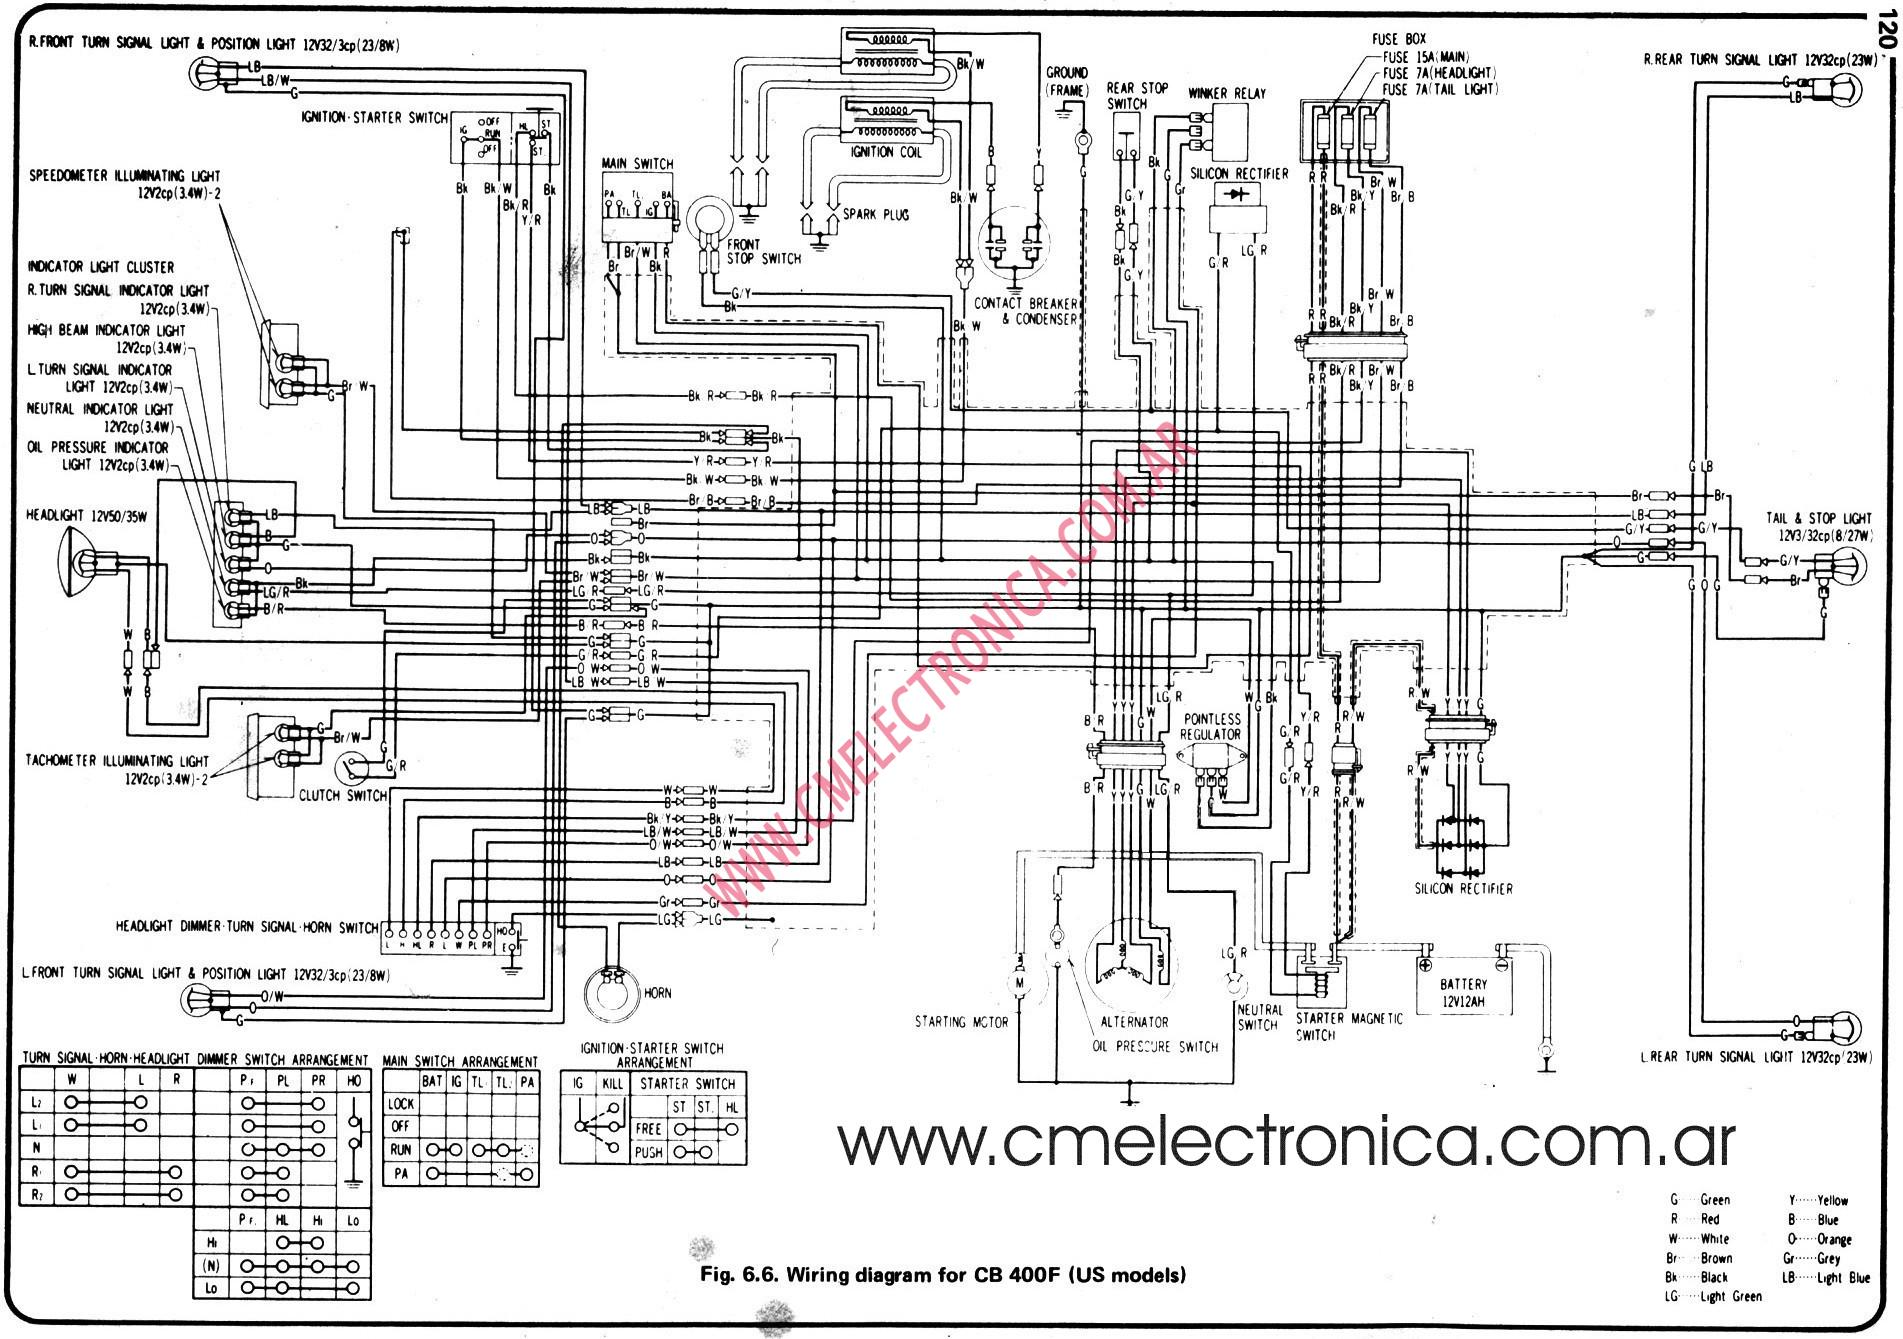 hight resolution of 1975 cb400f wiring diagram wiring diagram blogs 1994 honda accord wiring diagram honda cb400f wiring diagram